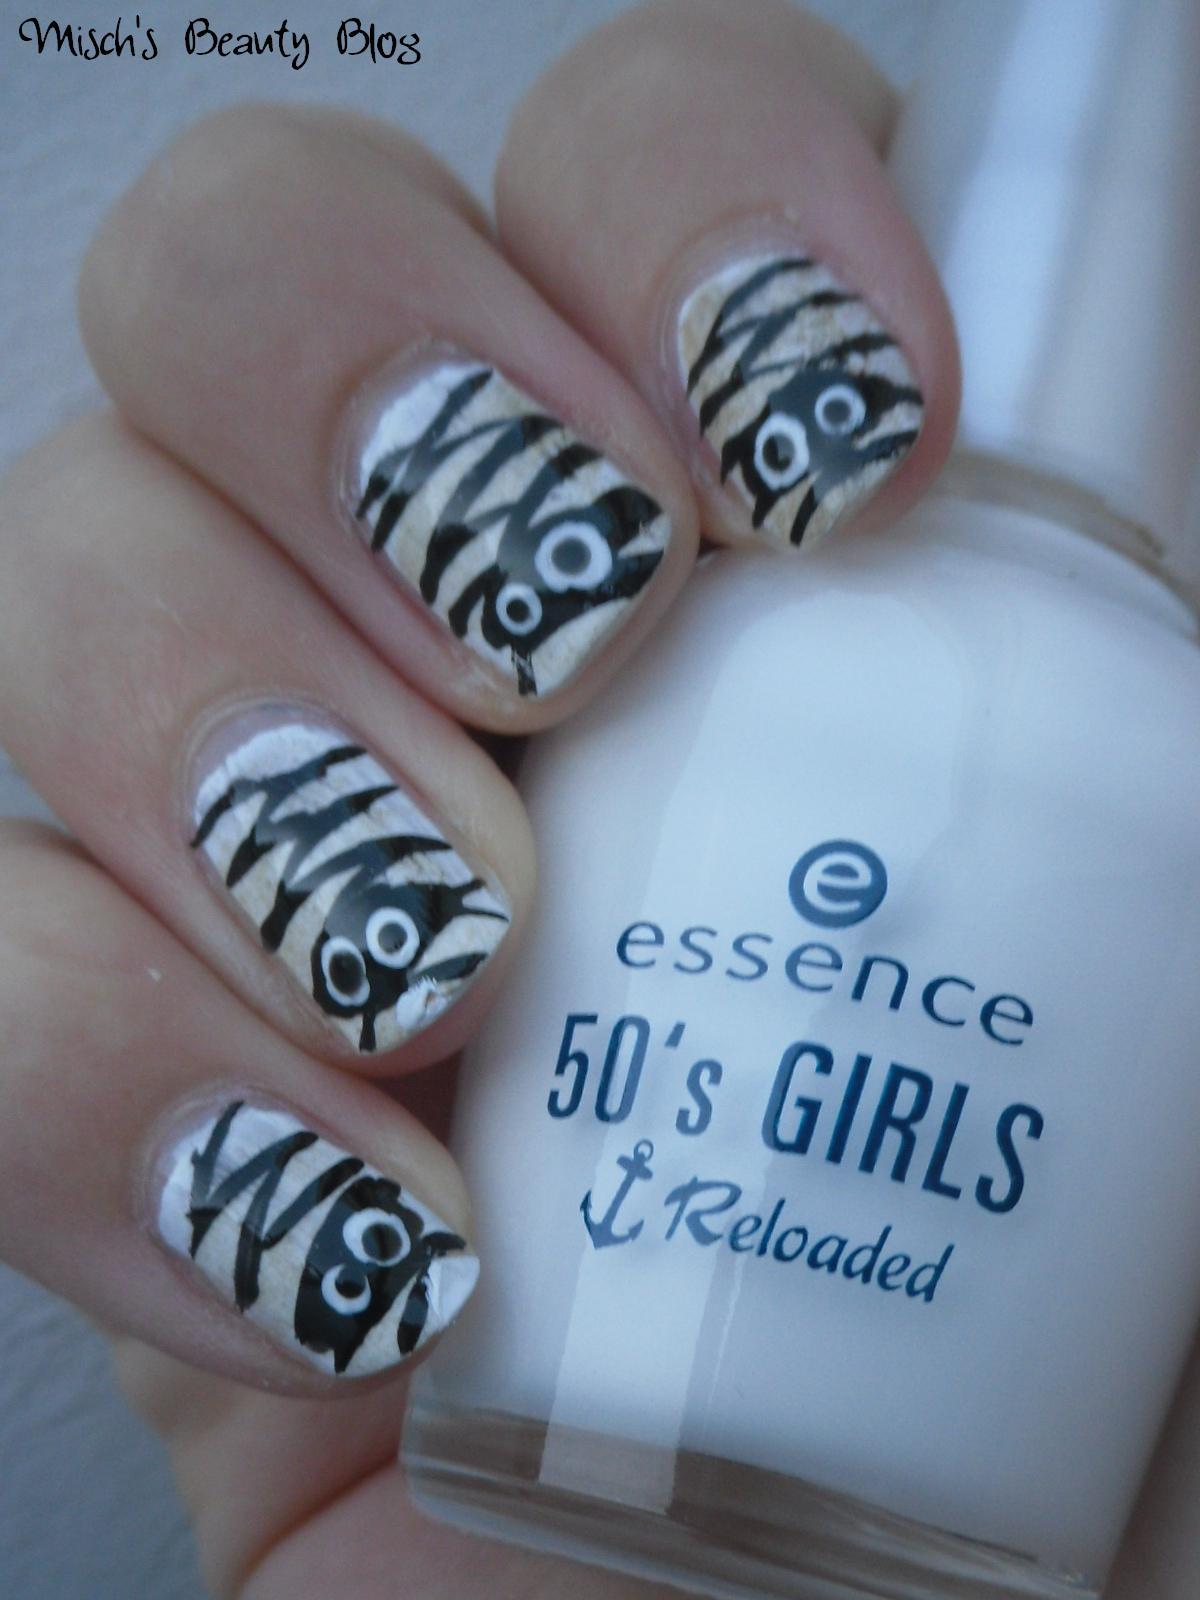 Misch S Beauty Blog Notd September 29th Fall Leaf Nail Art: Misch's Beauty Blog: October 2011